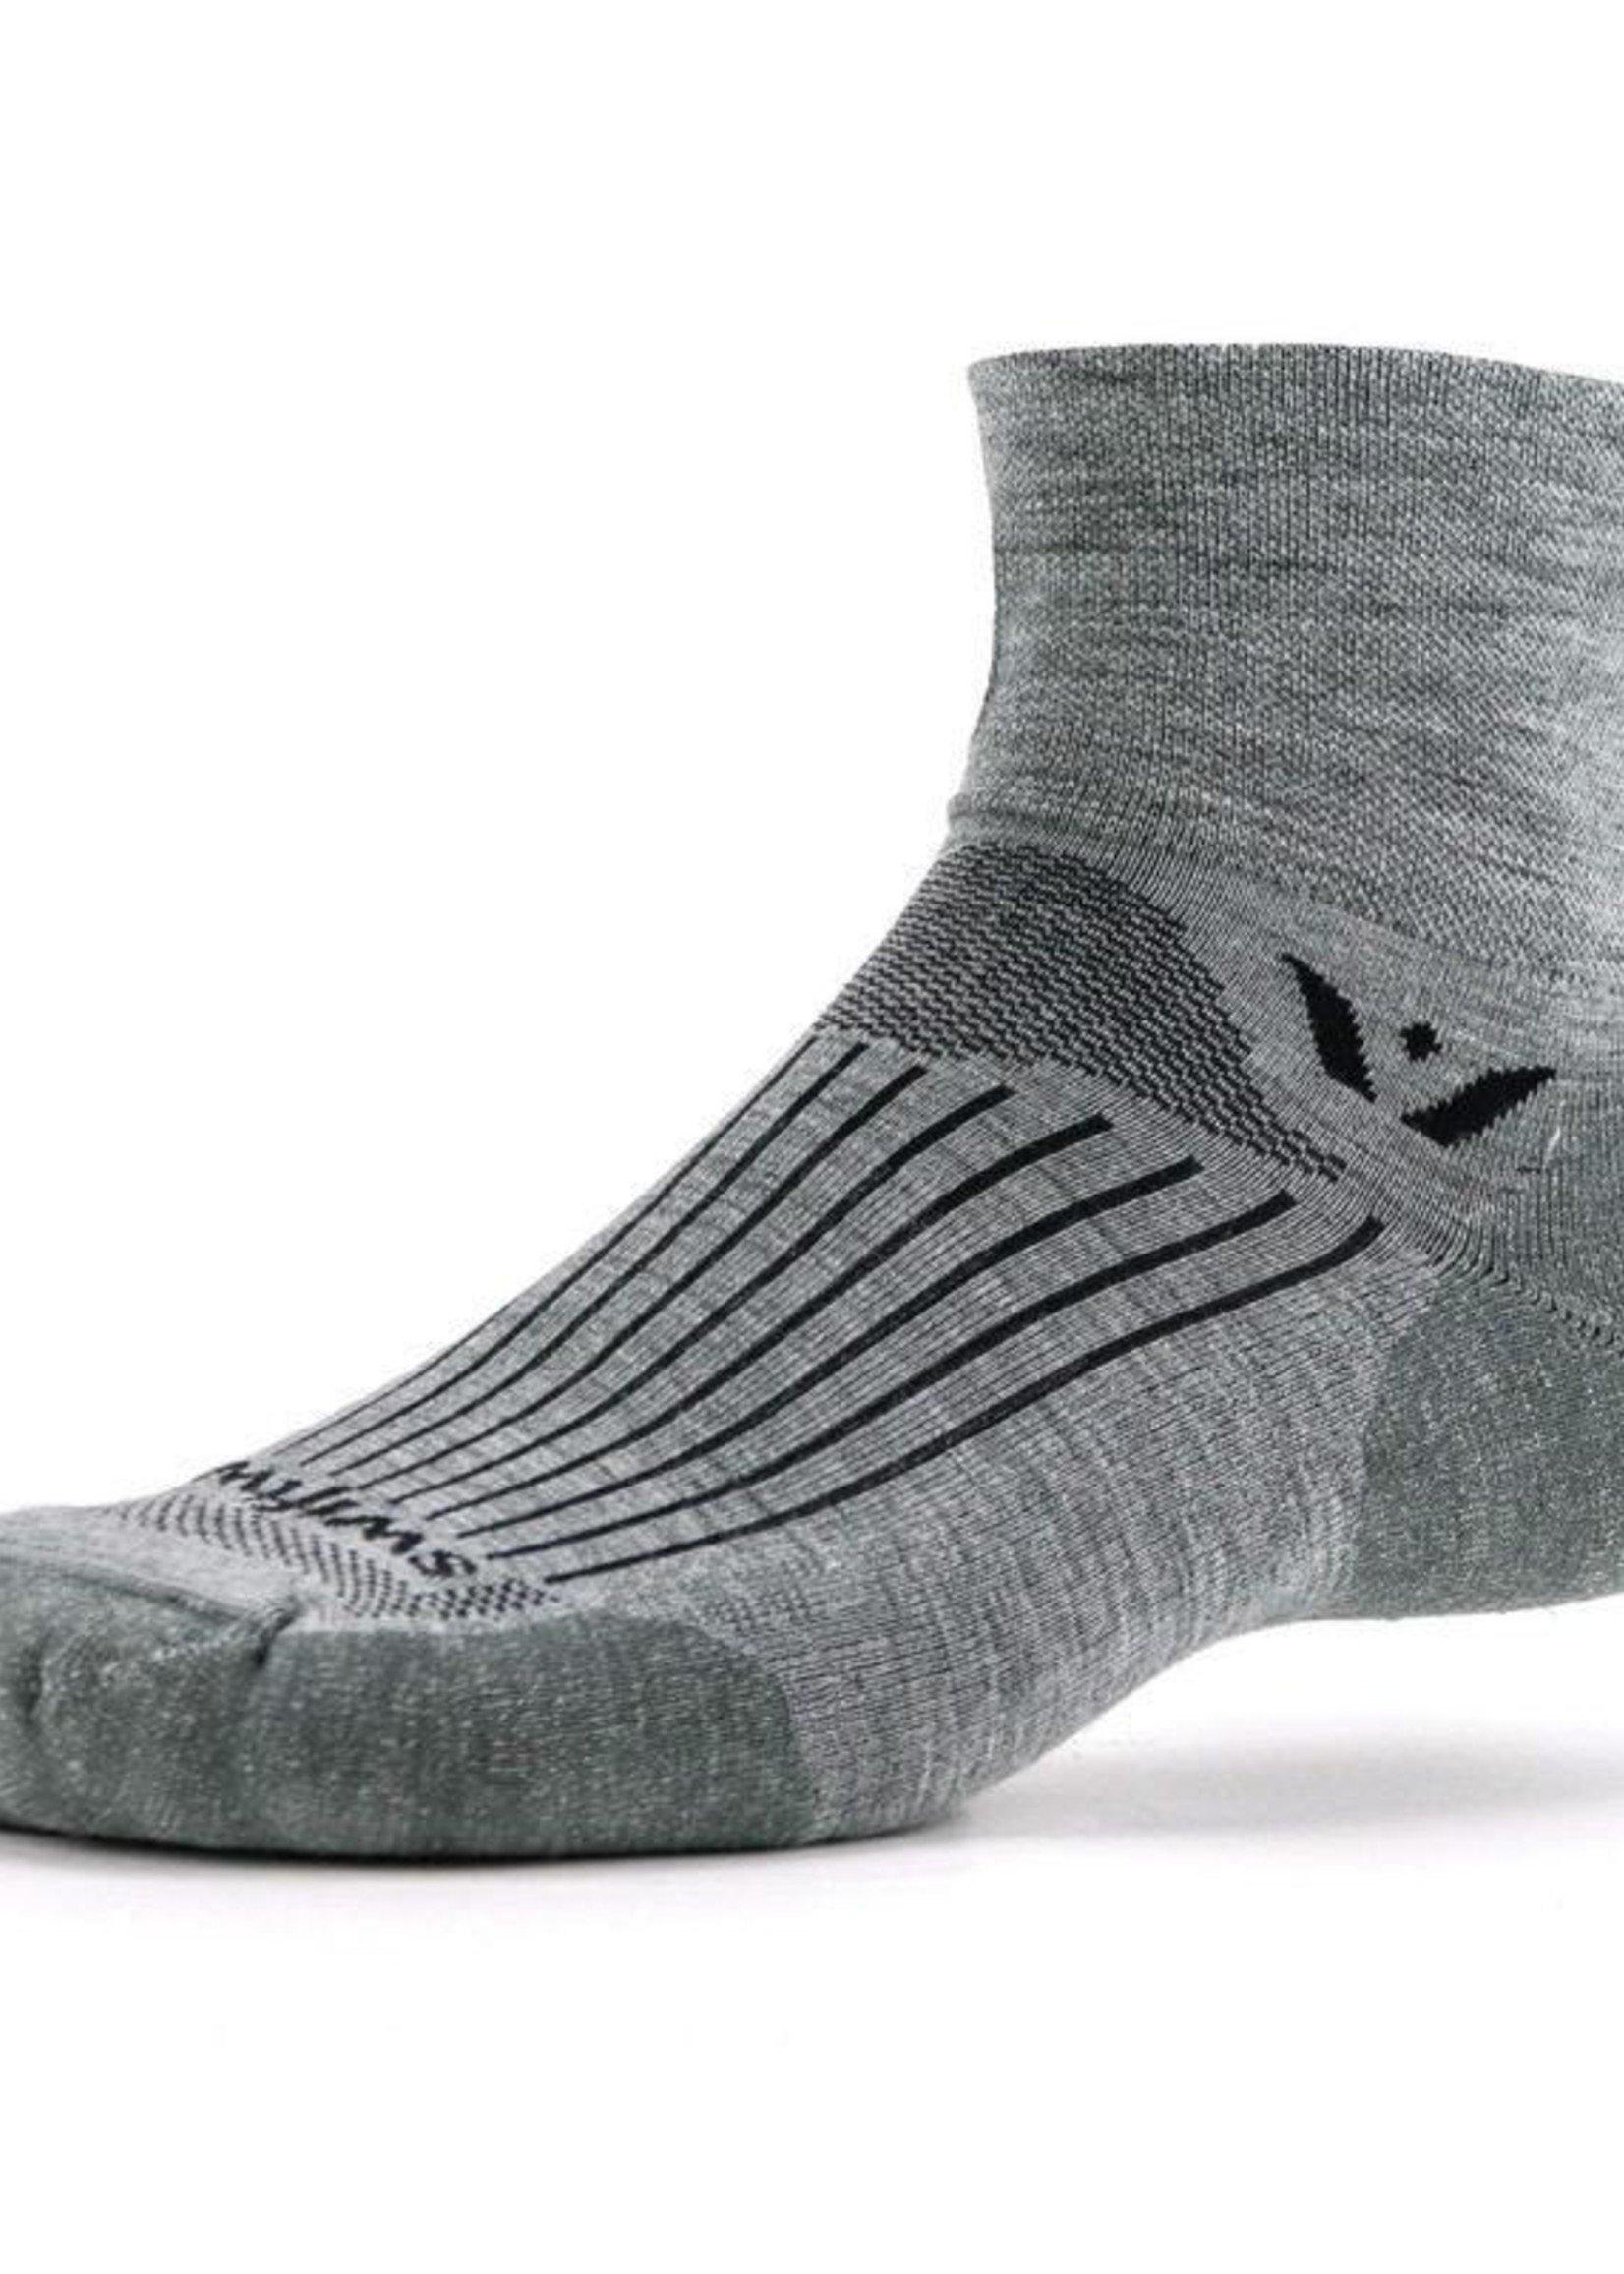 Swiftwick Swiftwick Pursuit Two Running Sock